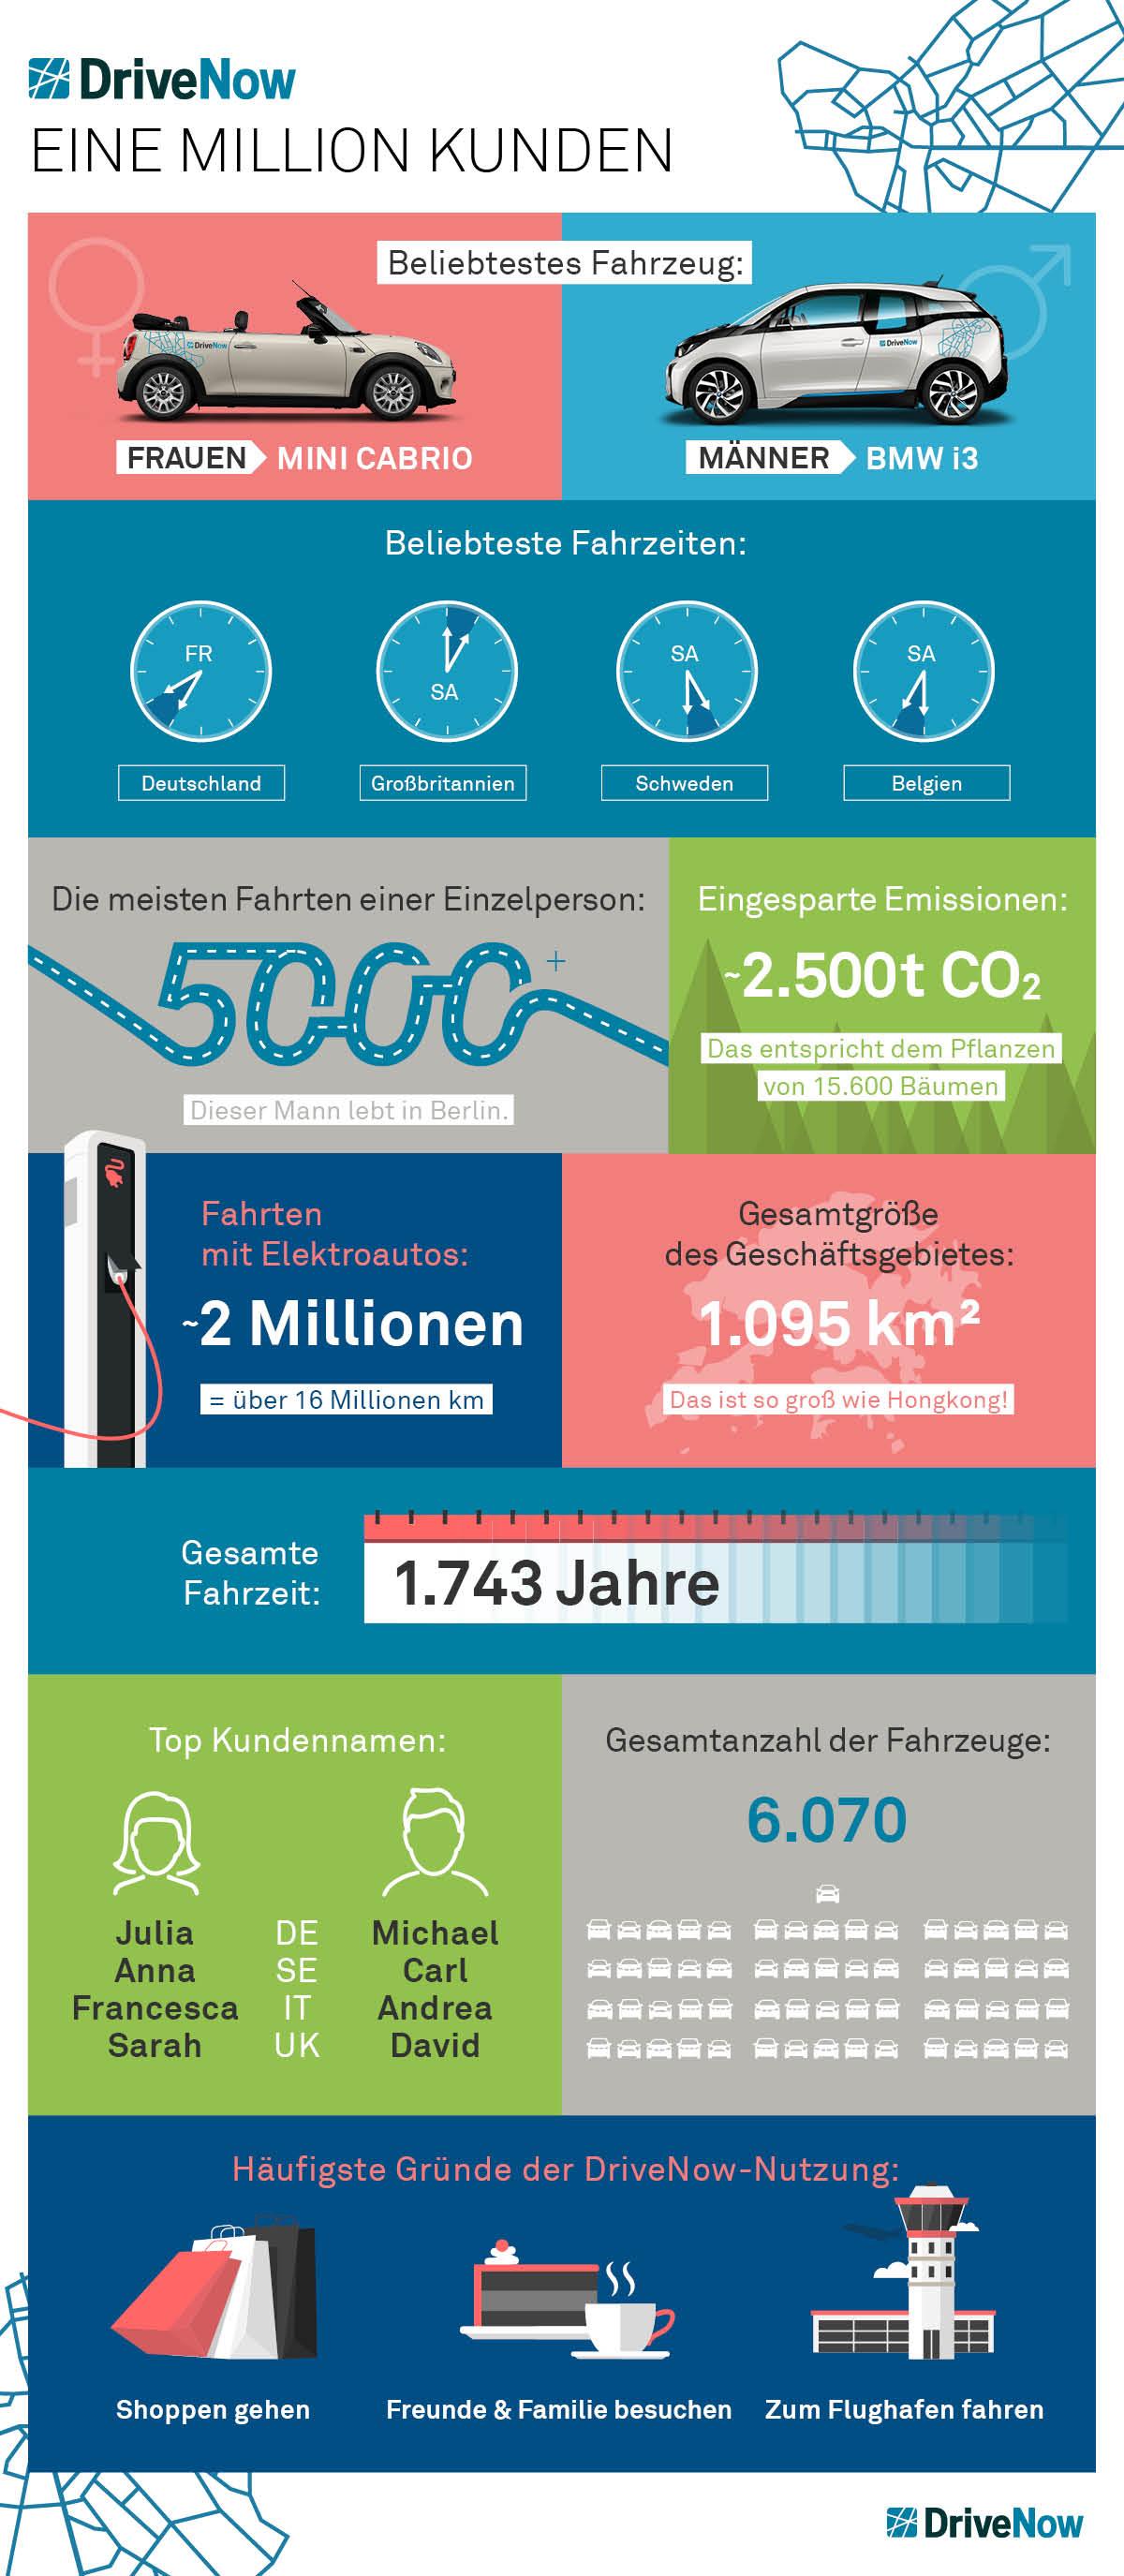 infografik-1mio-Kunden-DE